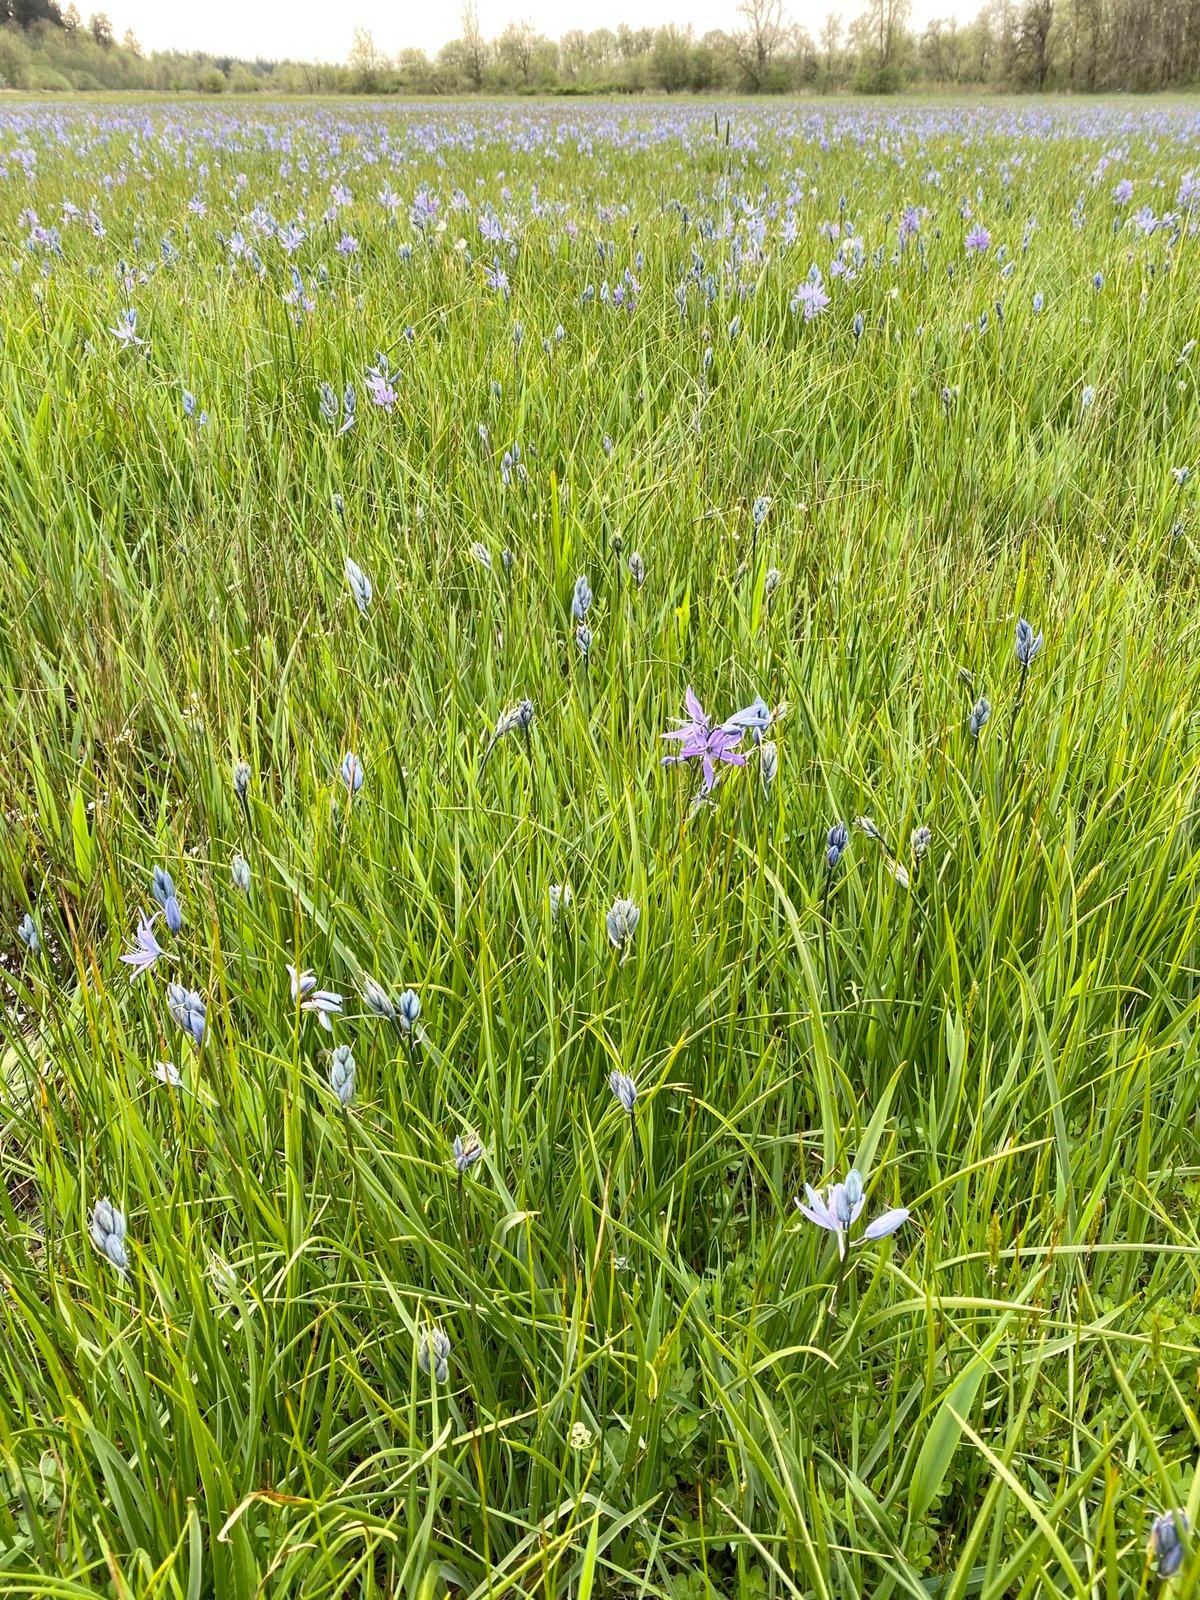 Camas Lily : Camassia quamash